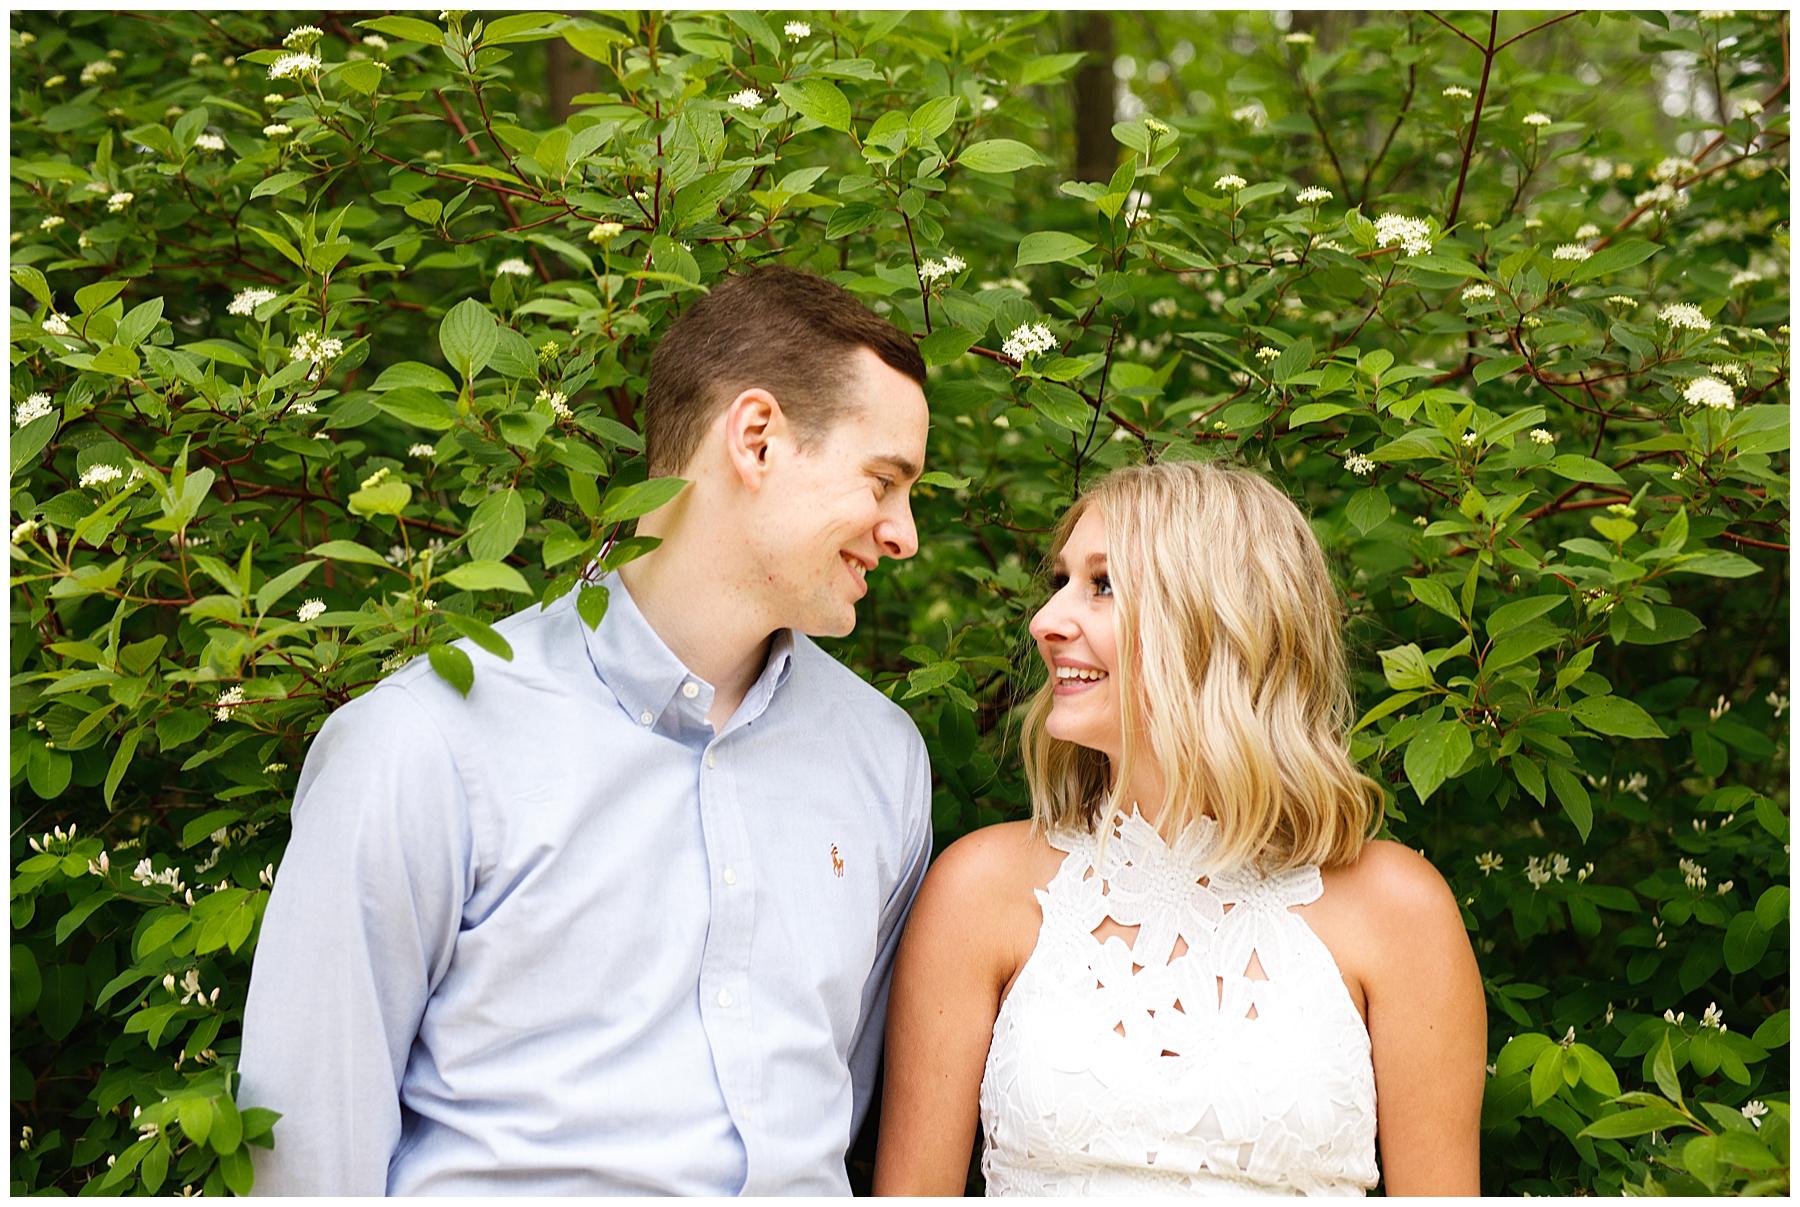 Hannah + Ben Engaged Milwaukee_0010.jpg